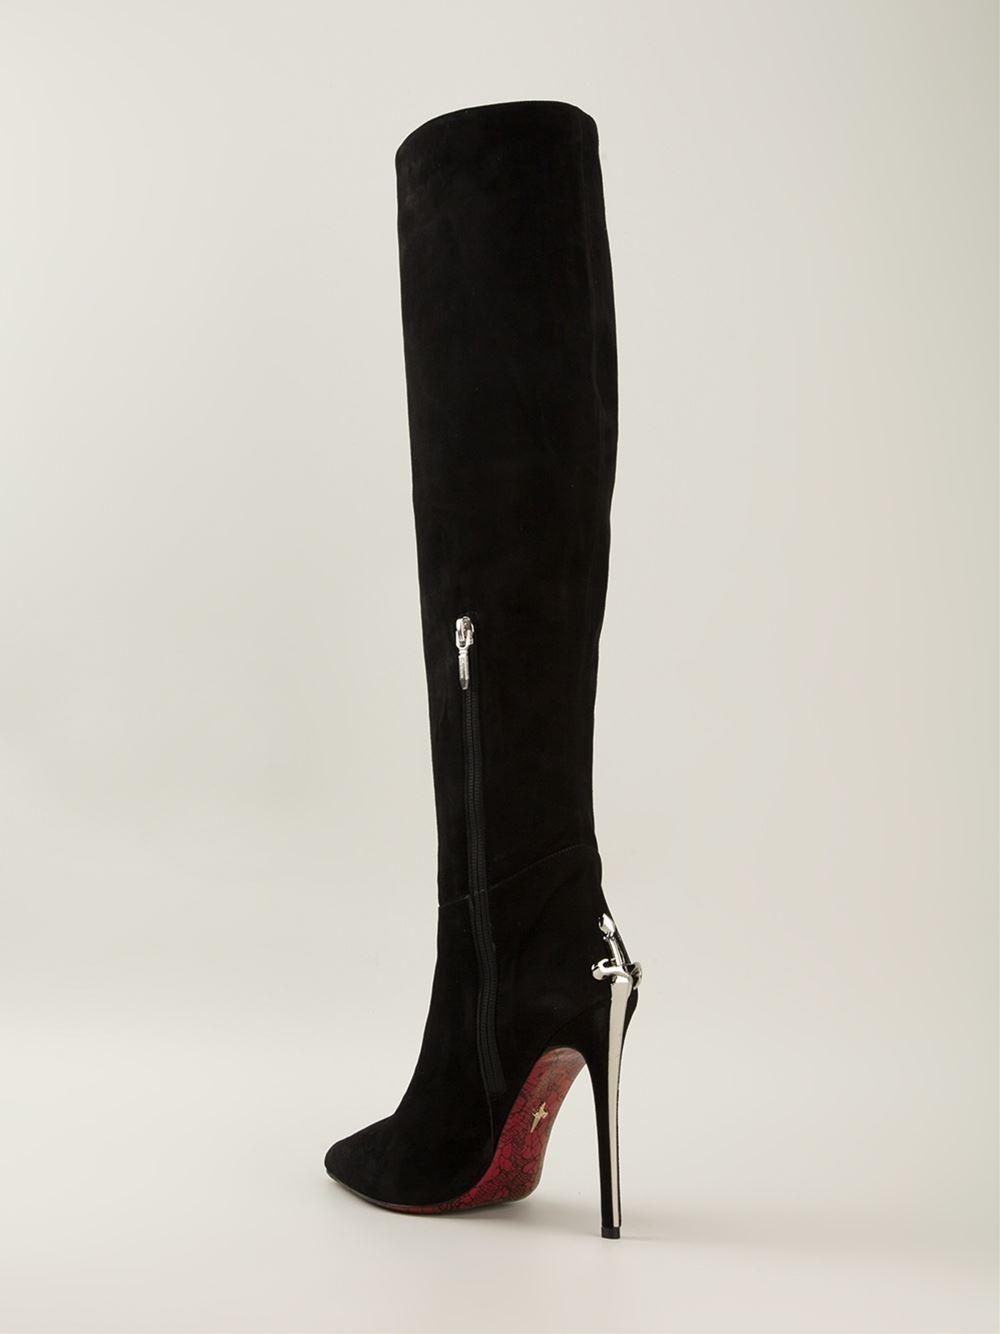 1fcdd4b65e8 cesare-paciotti-black -dagger-detail-boots-product-1-26791717-1-019881031-normal.jpeg